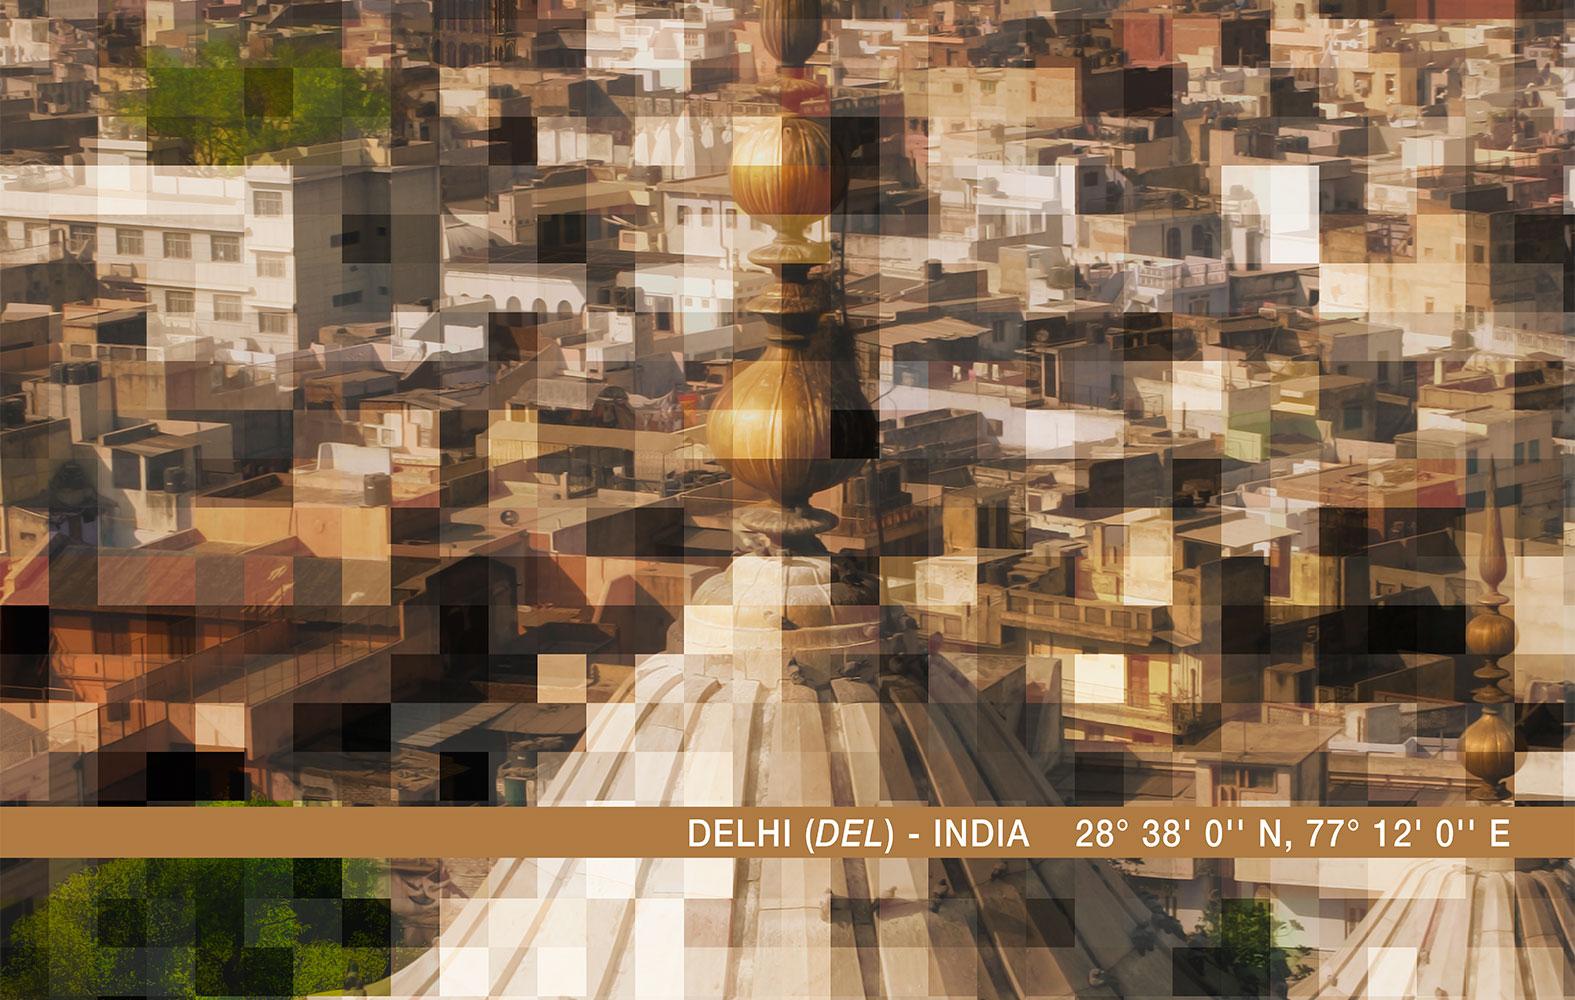 StudioErnst-HMShost-cityscapes-delhi